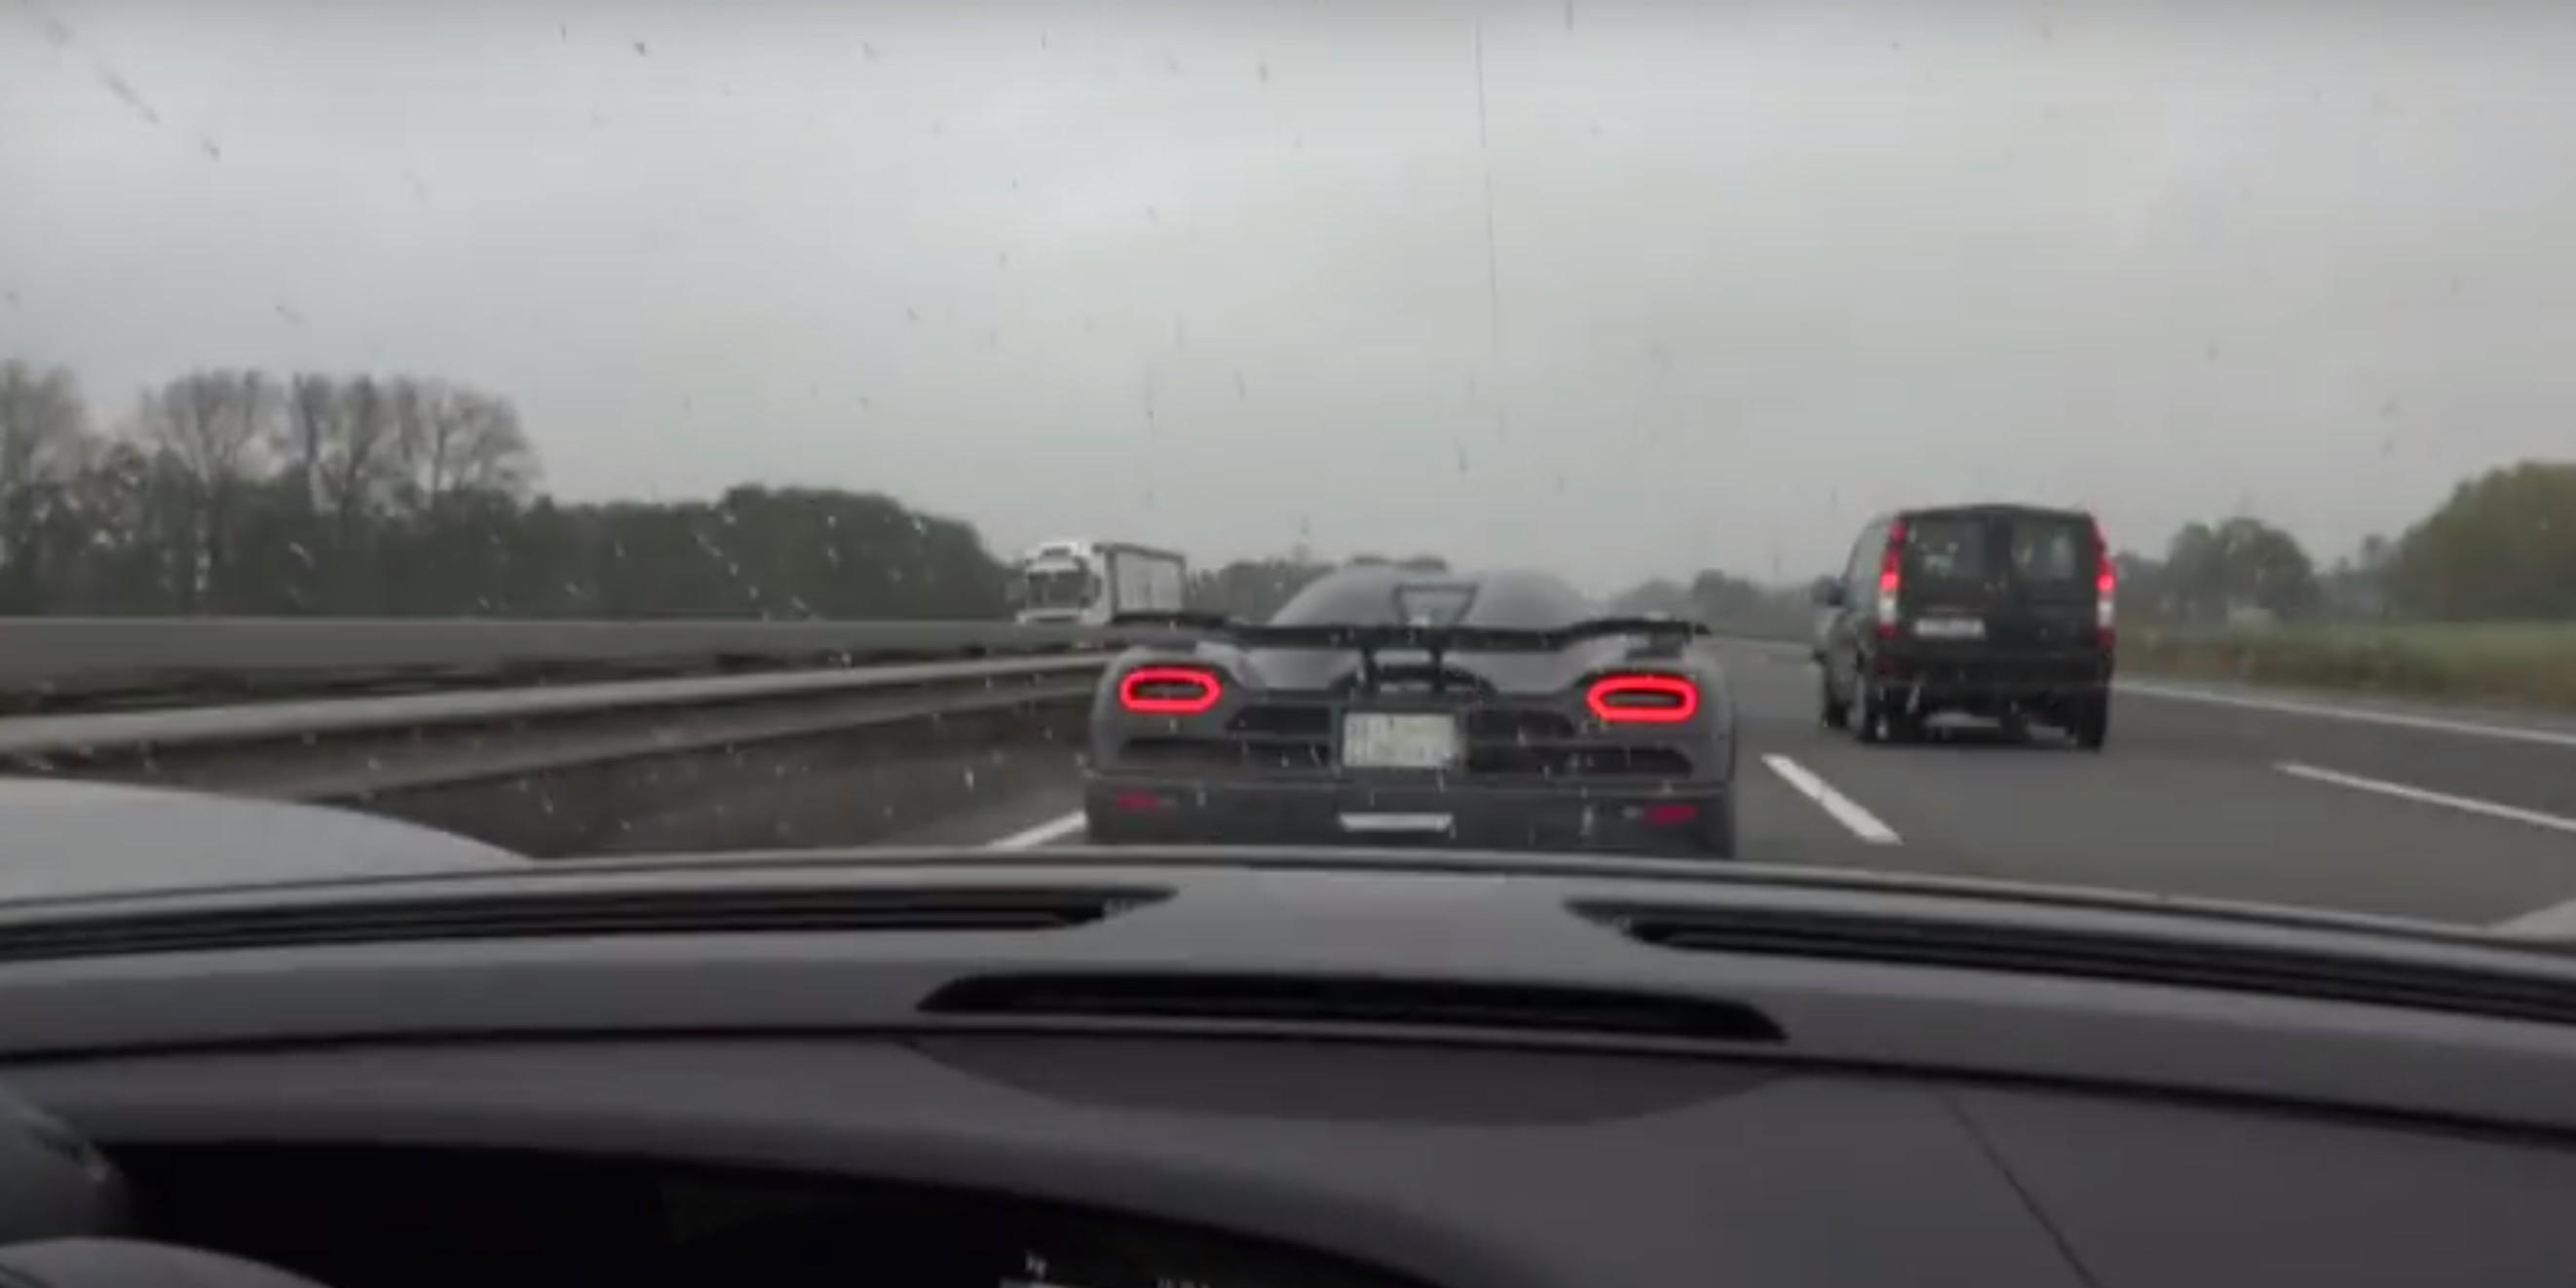 Porsche 918 Spyder Chases Koenigsegg Agera R On Autobahn